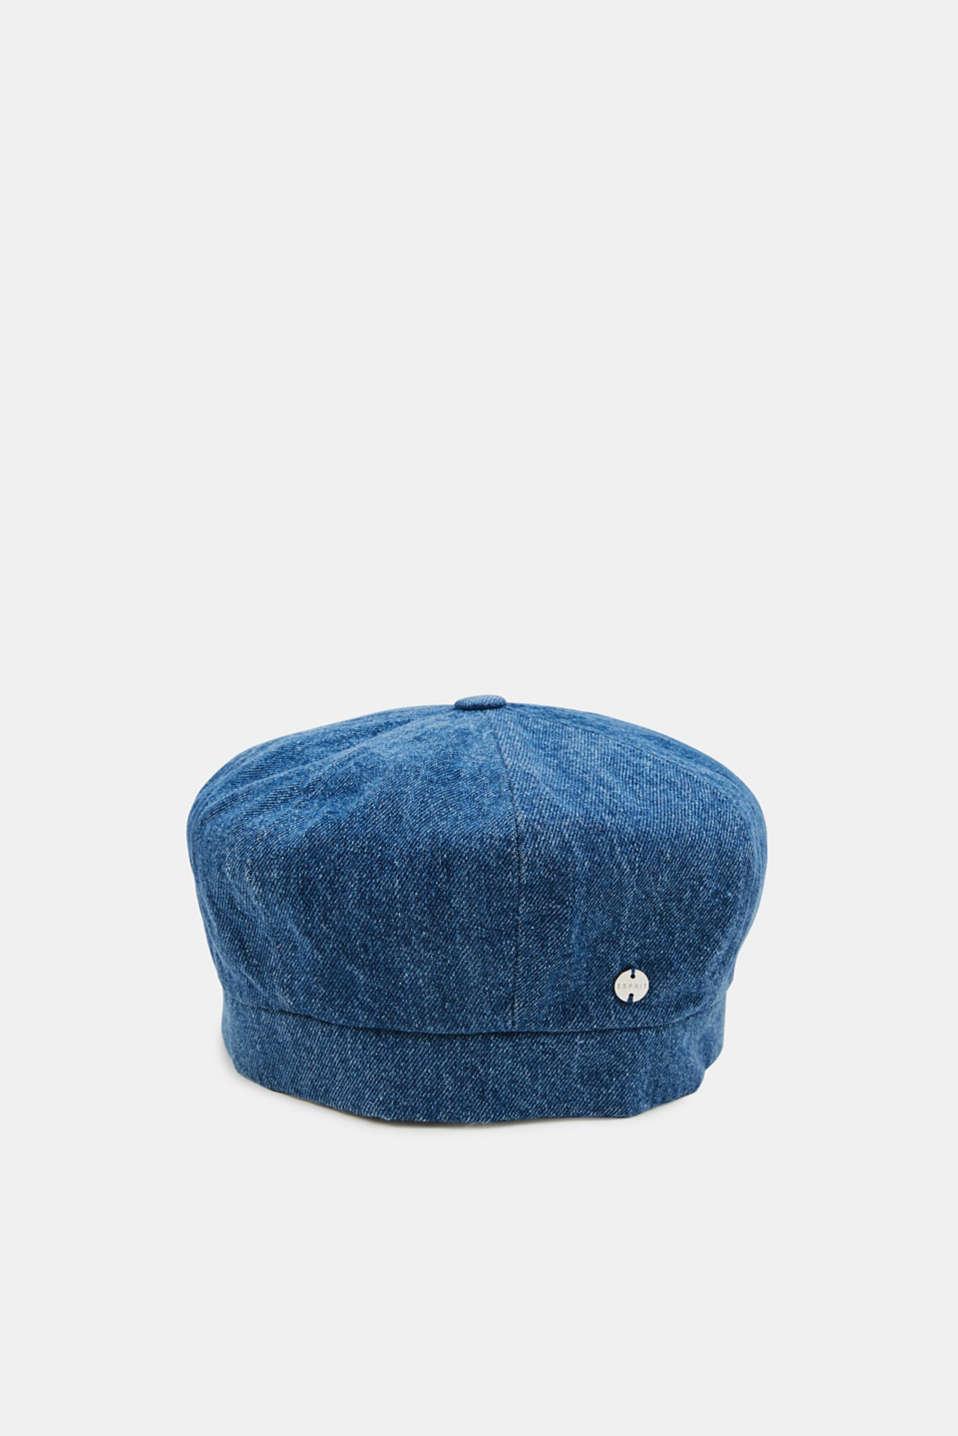 Denim beret in 100% cotton, NAVY, detail image number 0